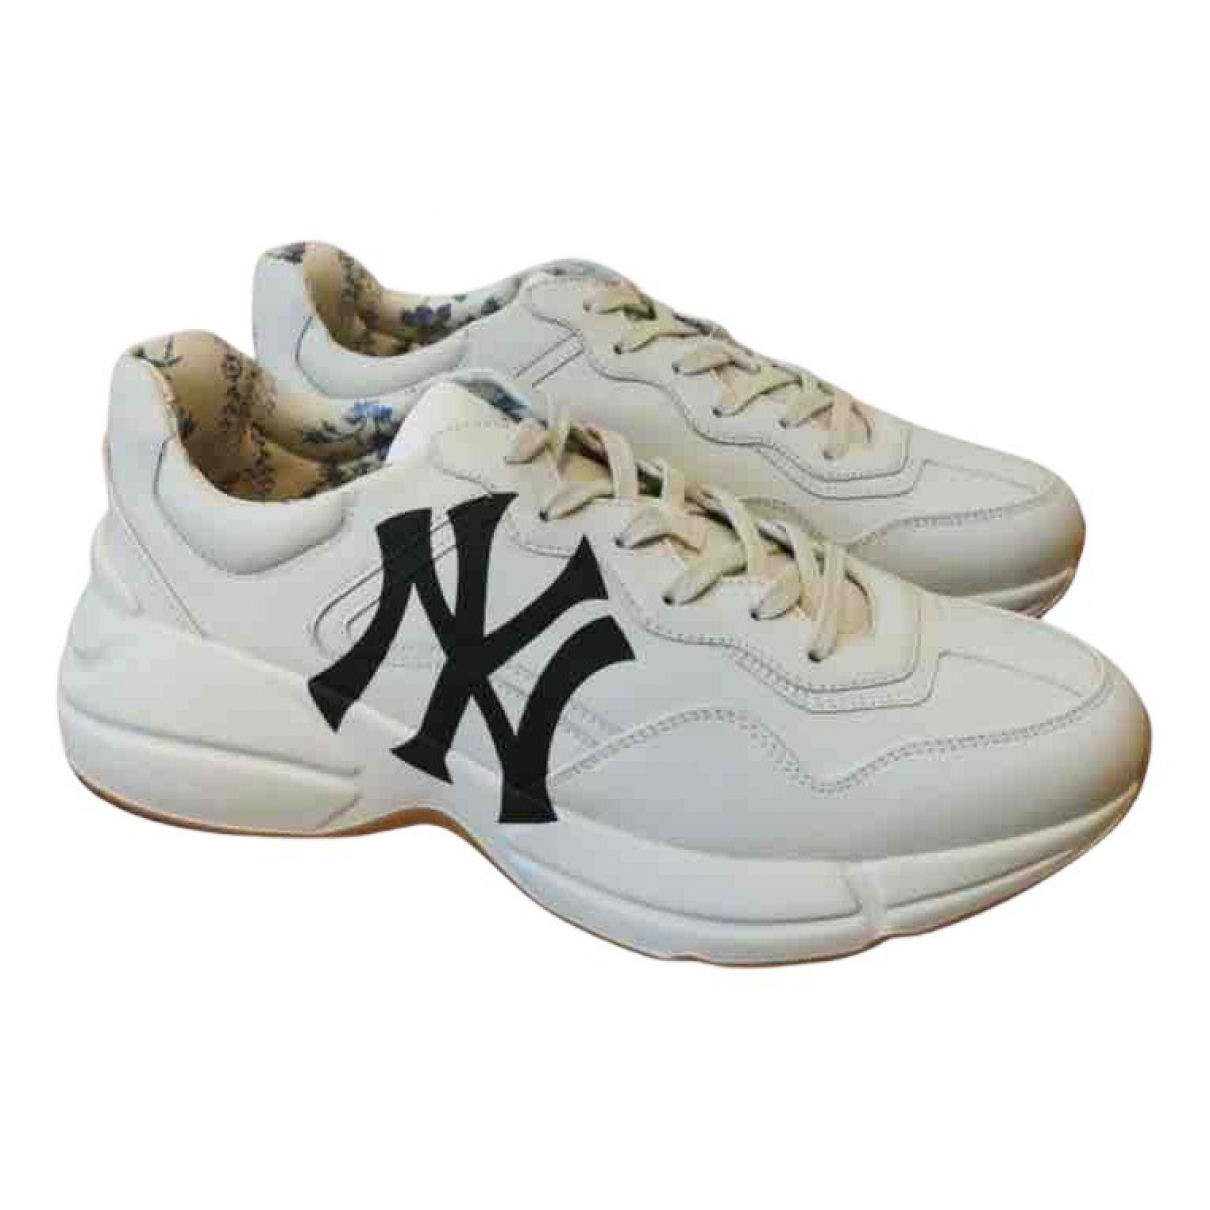 Gucci - Baskets Rhyton pour homme en cuir - blanc